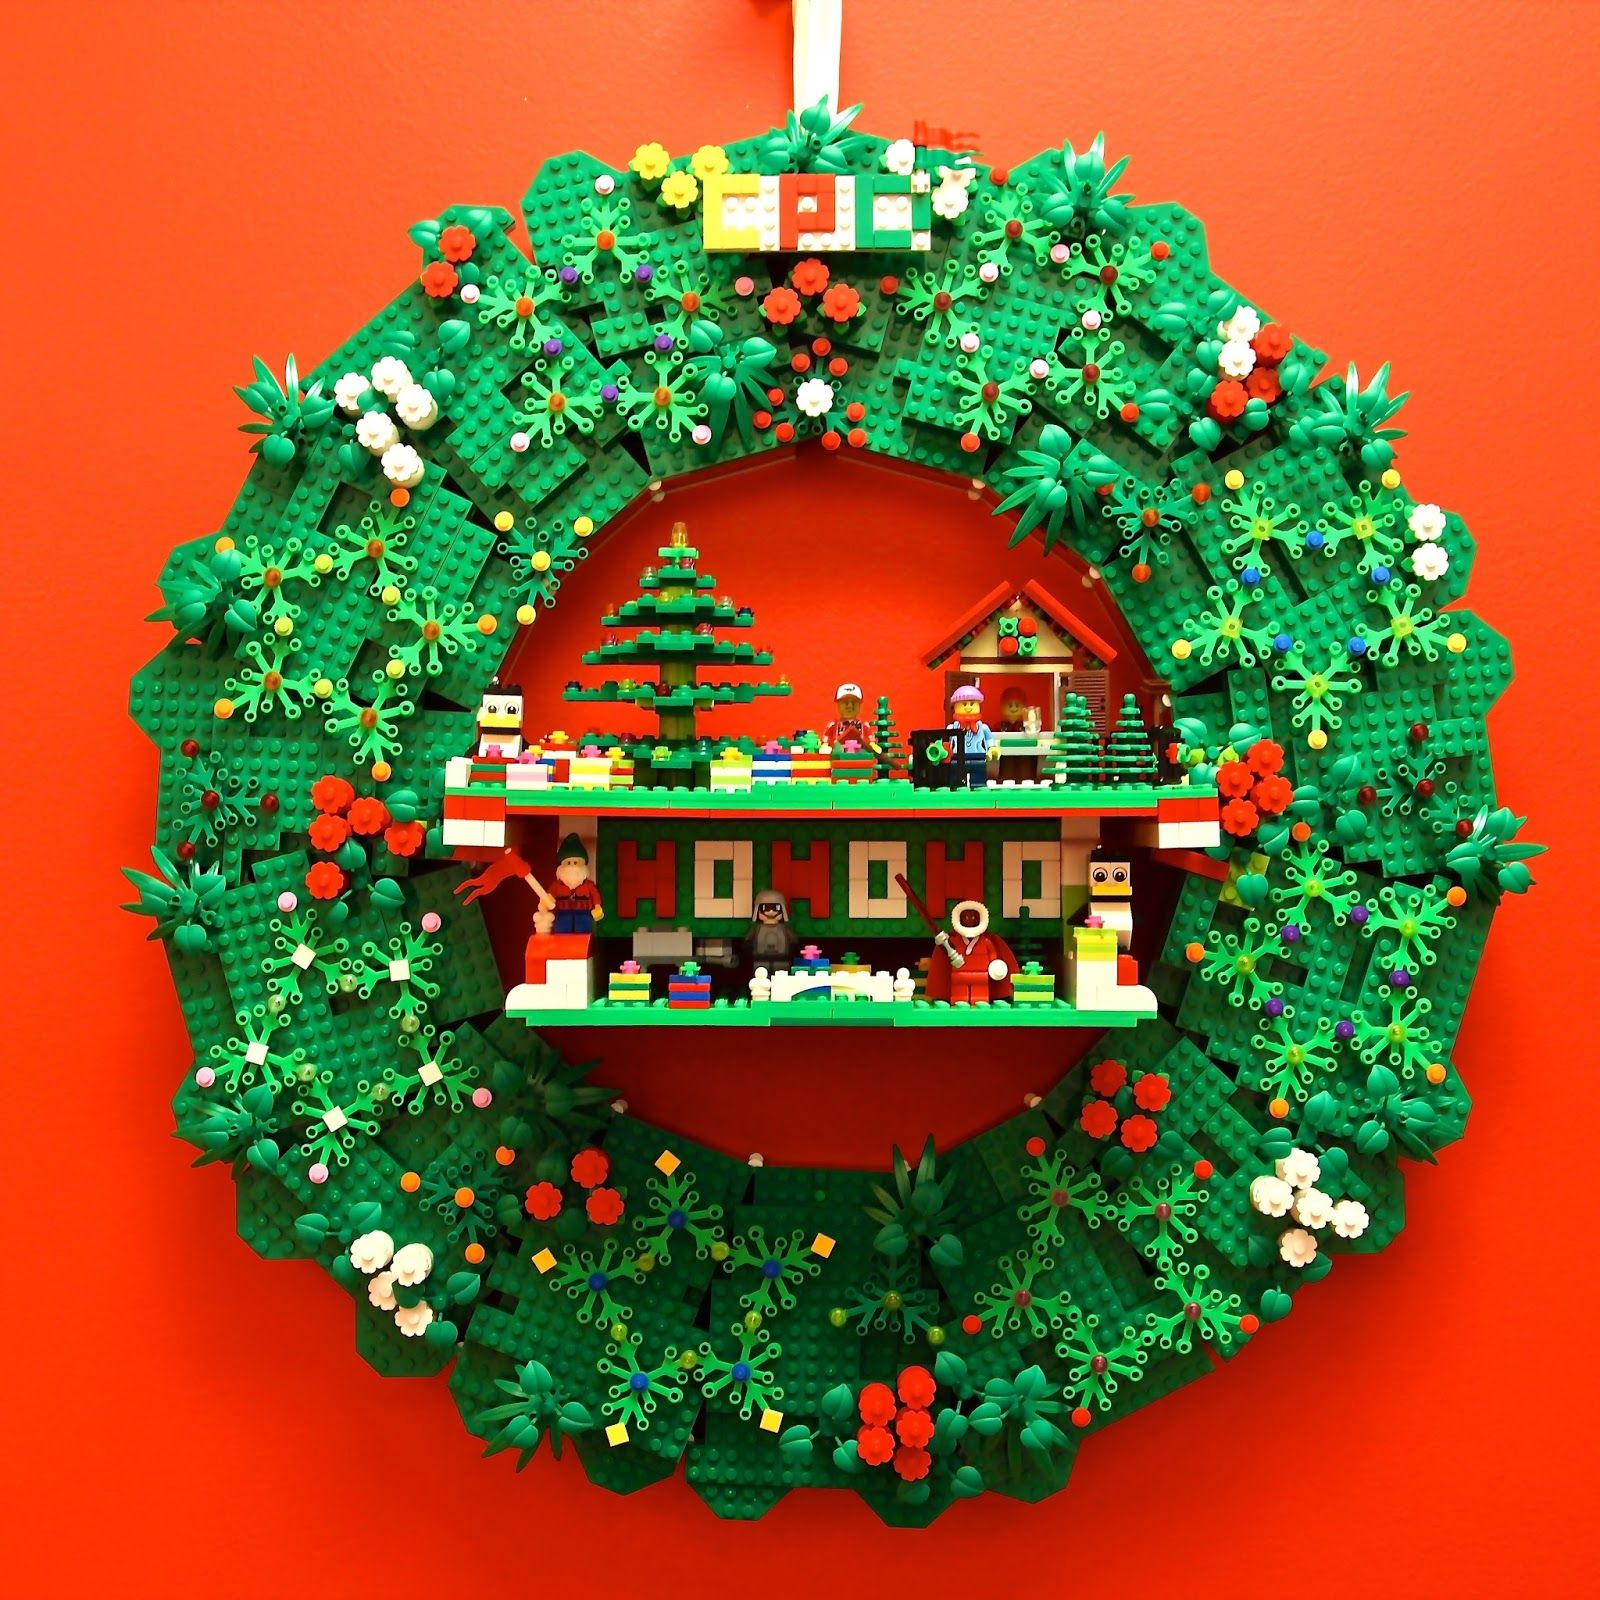 Four Fun Lego Christmas Wreath Ideas Lego Christmas Lego Christmas Village Christmas Wreaths